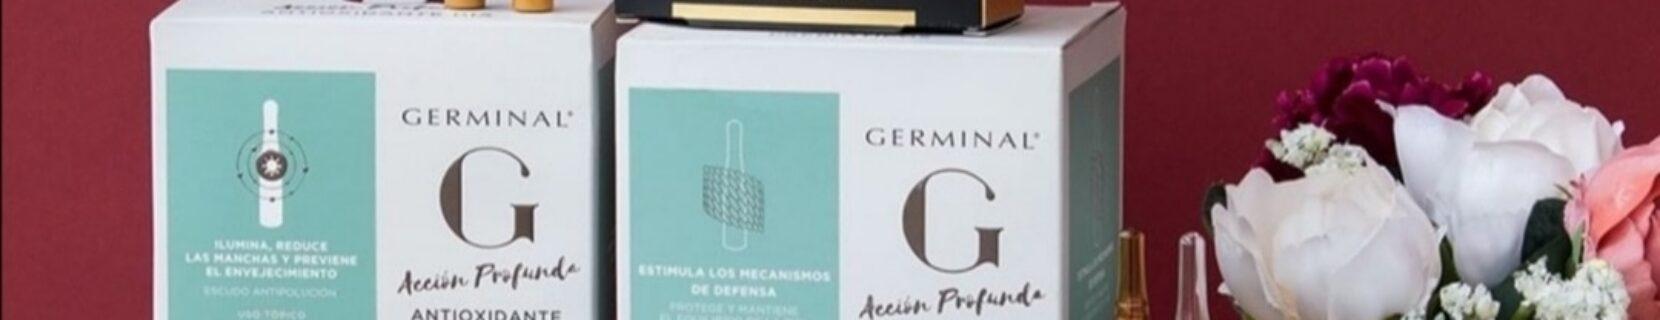 Promo Germinal!!!!